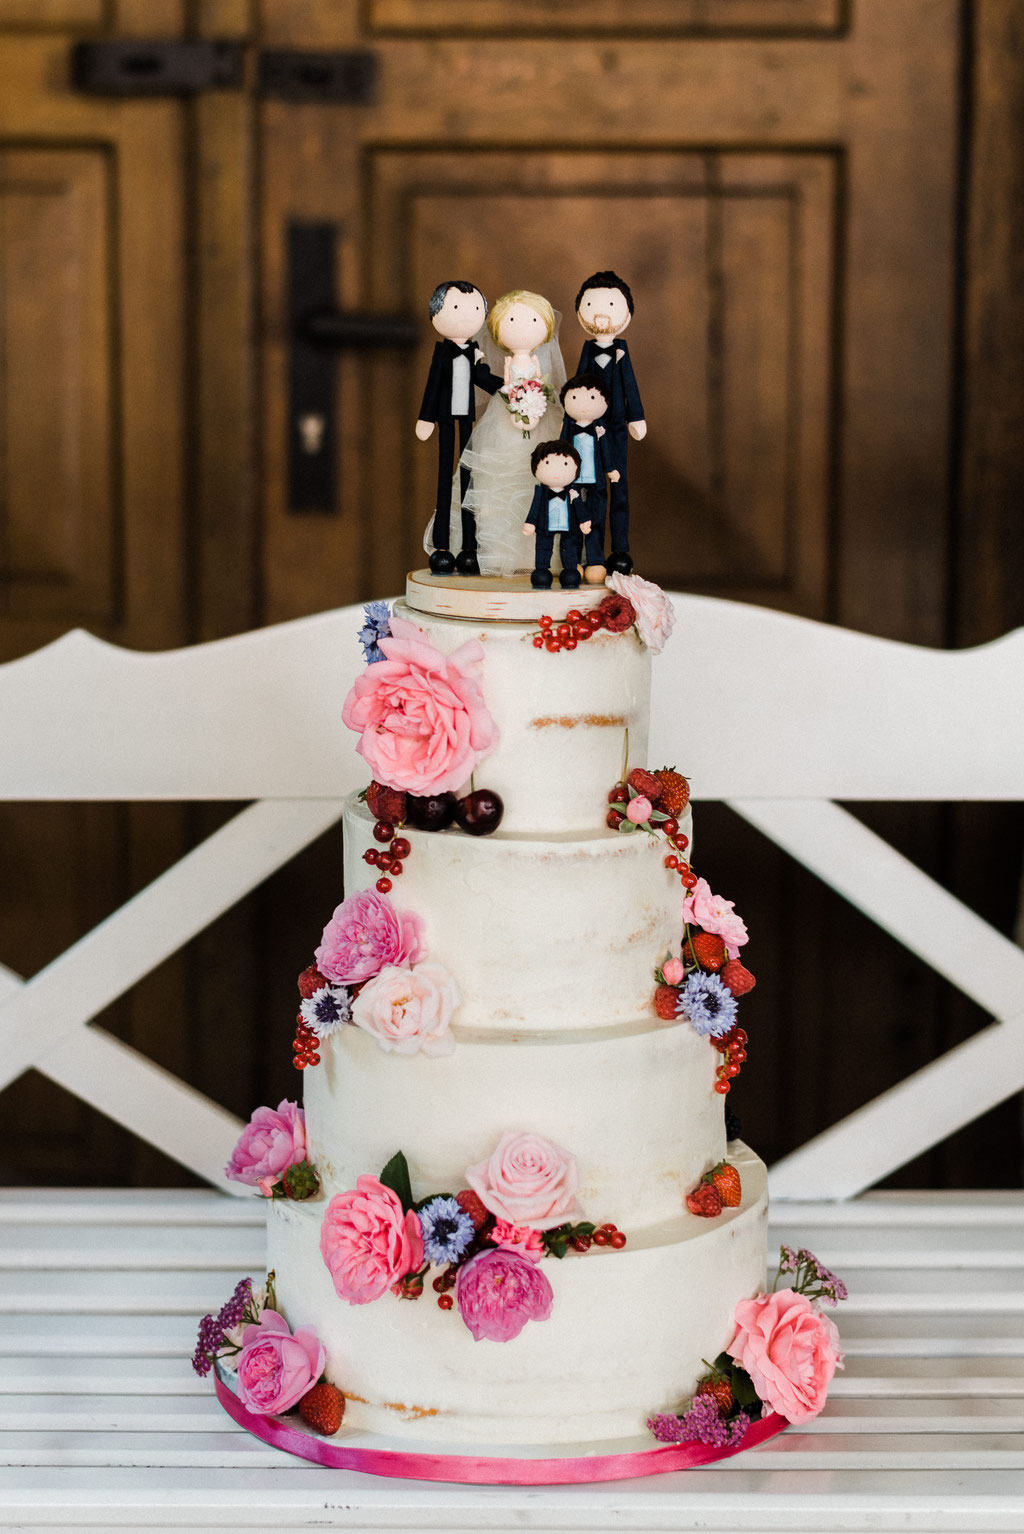 Foto: https://www.weddingpilots.com